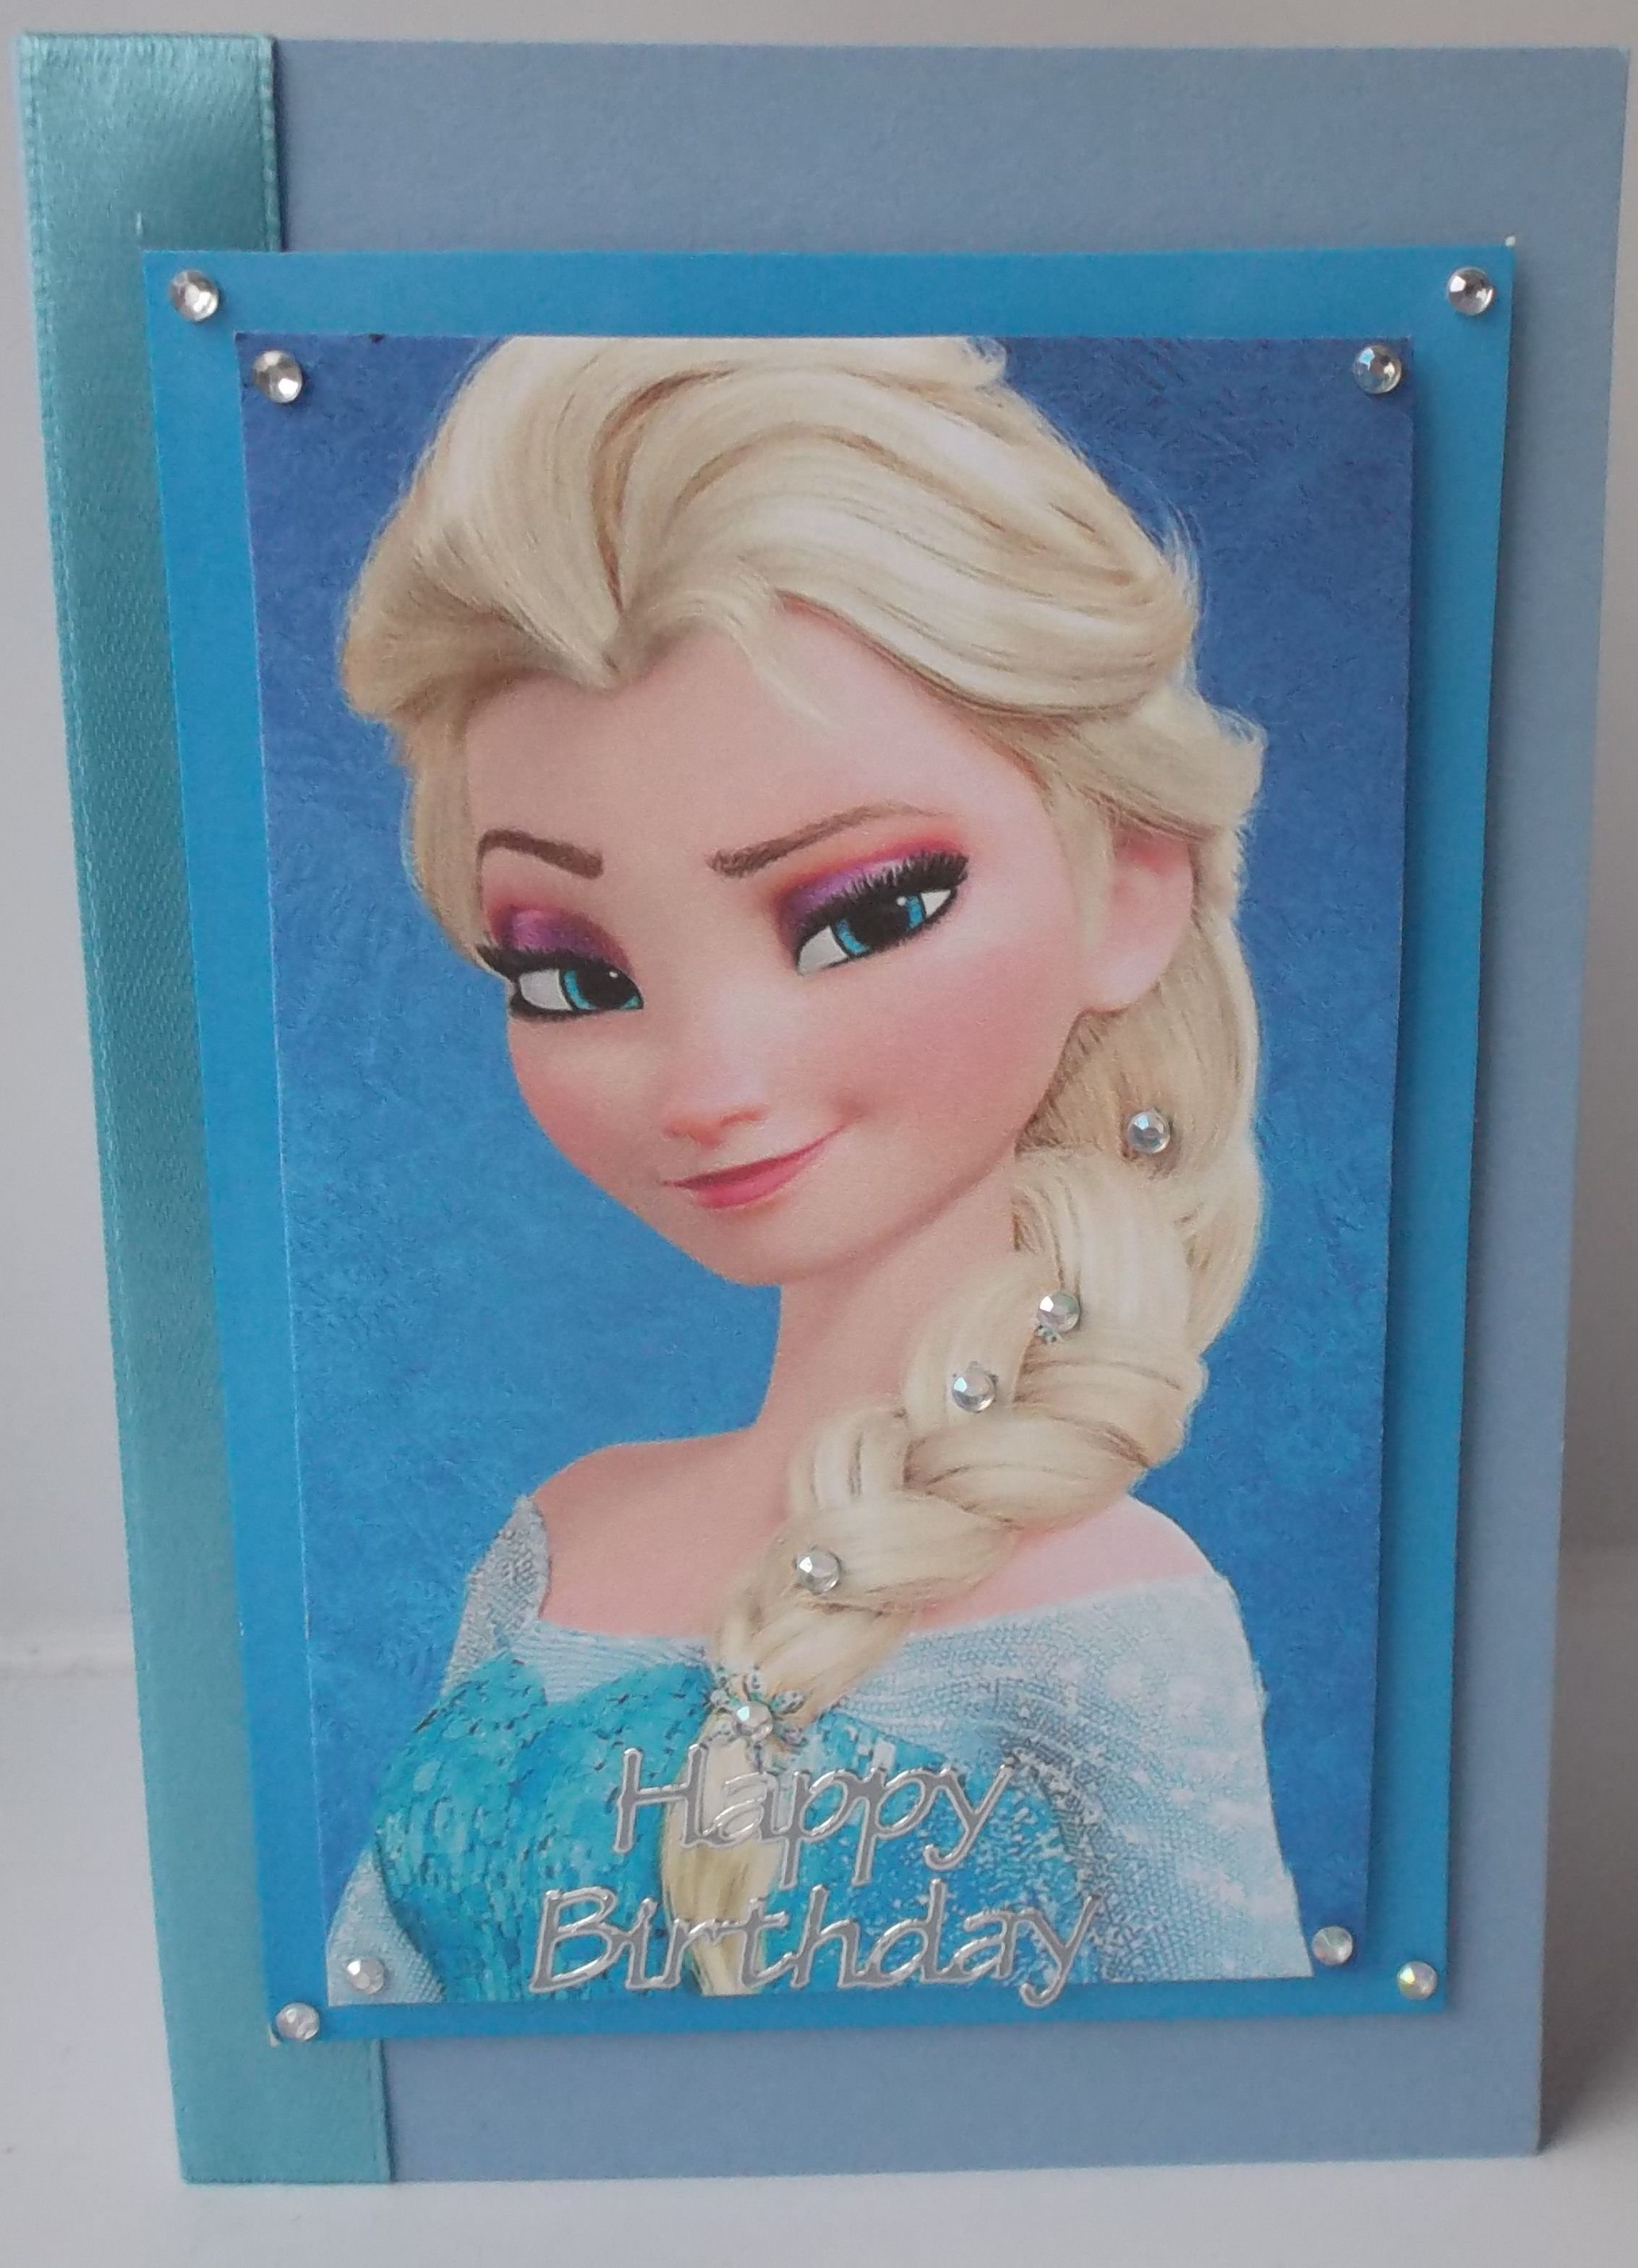 Handmade Frozen Birthday Card Elsa Character Cards Pinterest